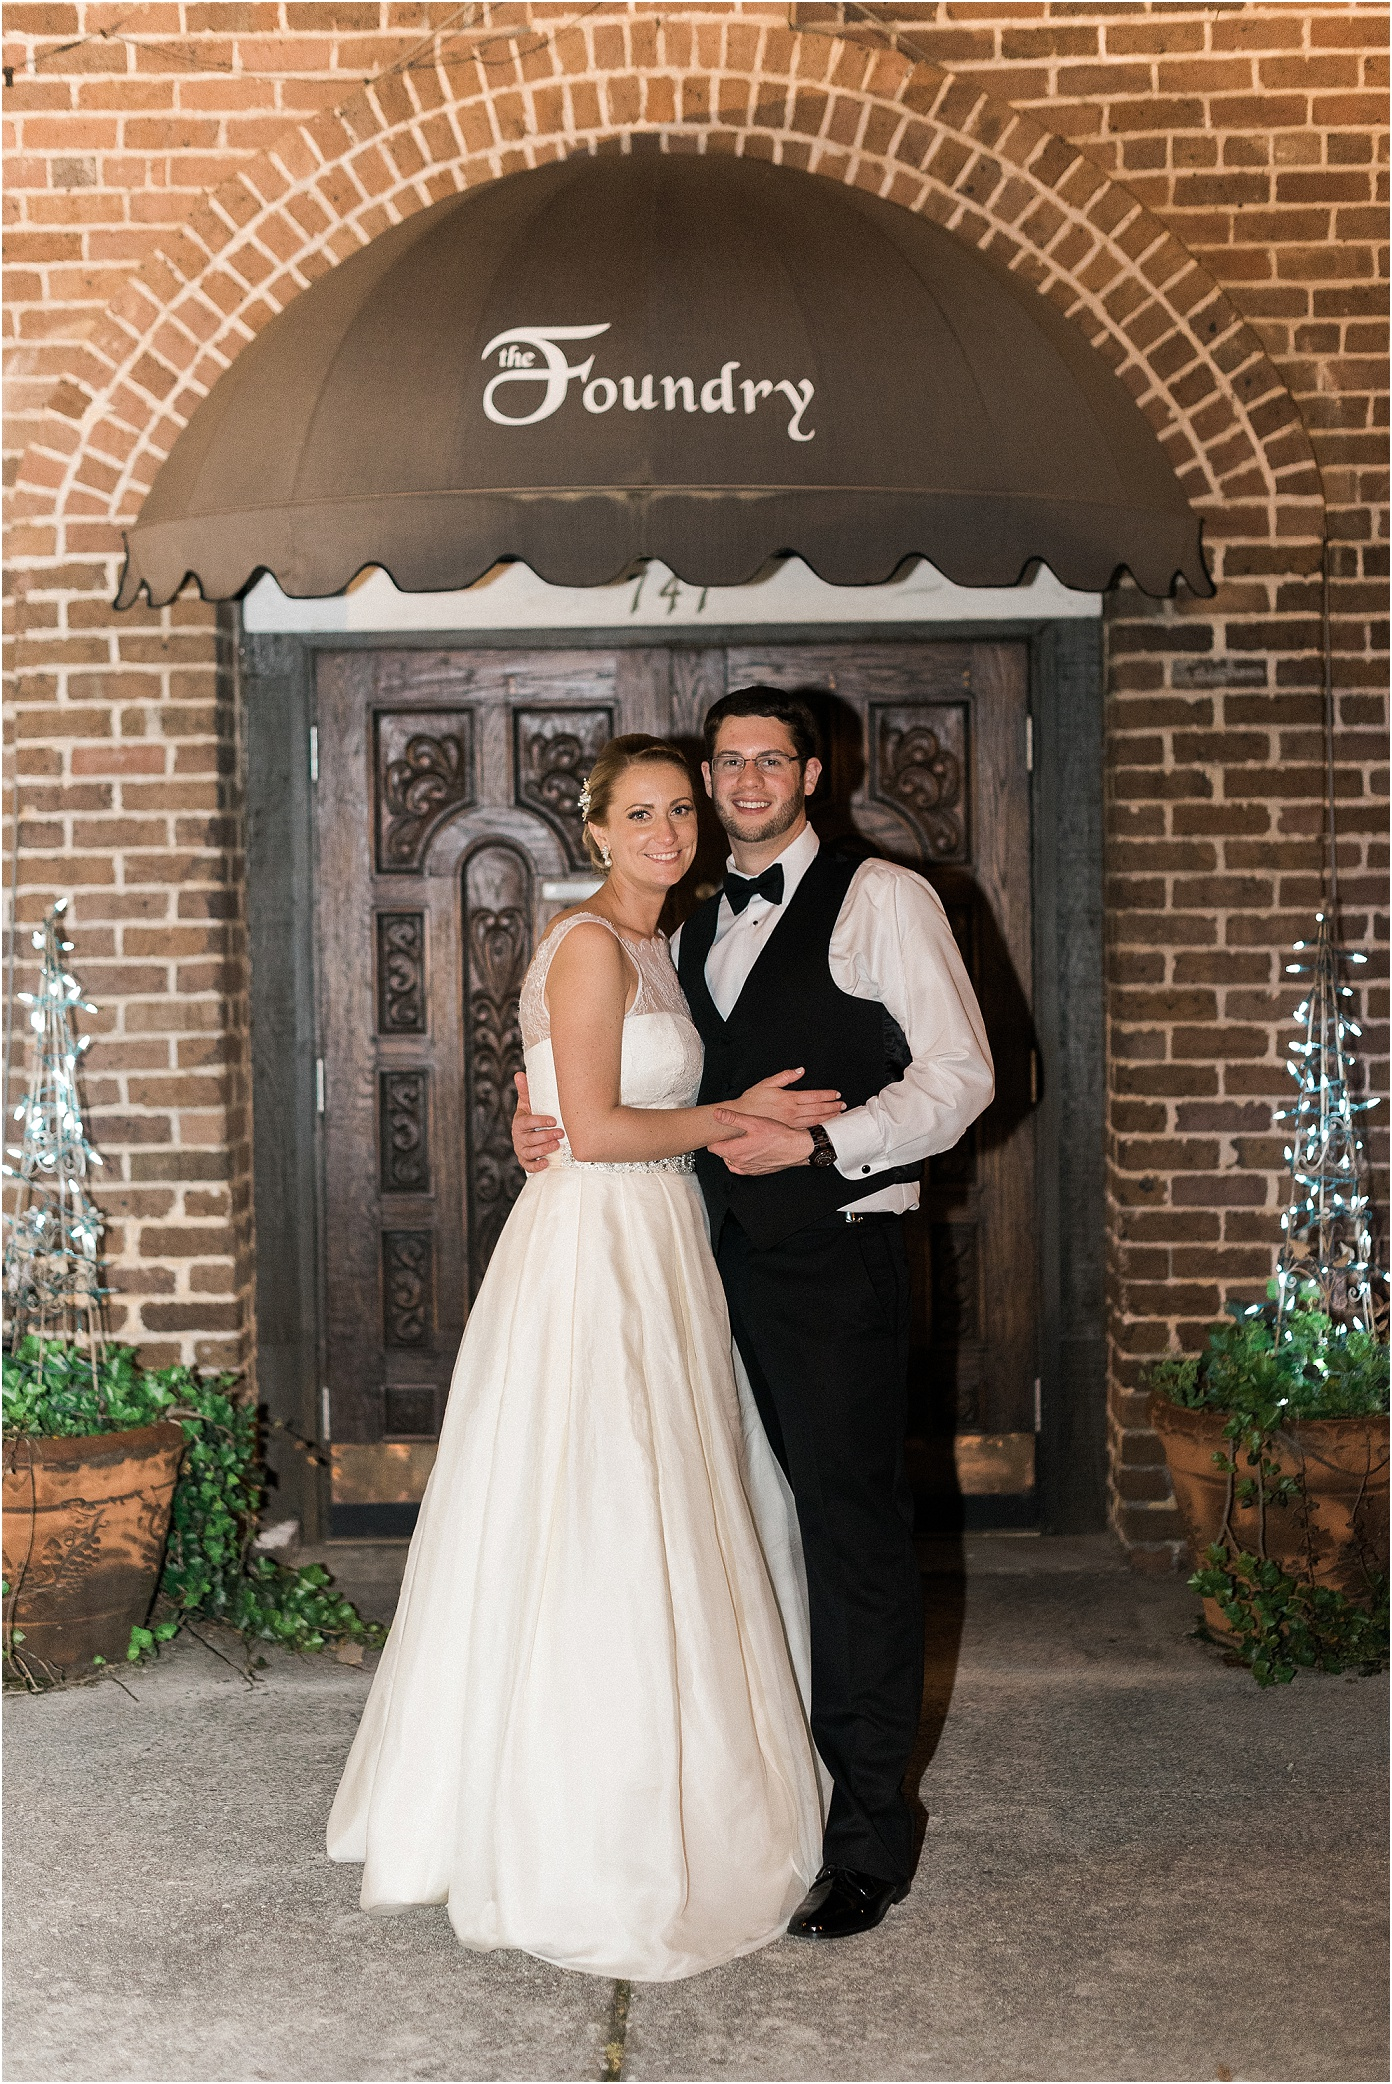 Worlds Fair Park and Foundry Wedding